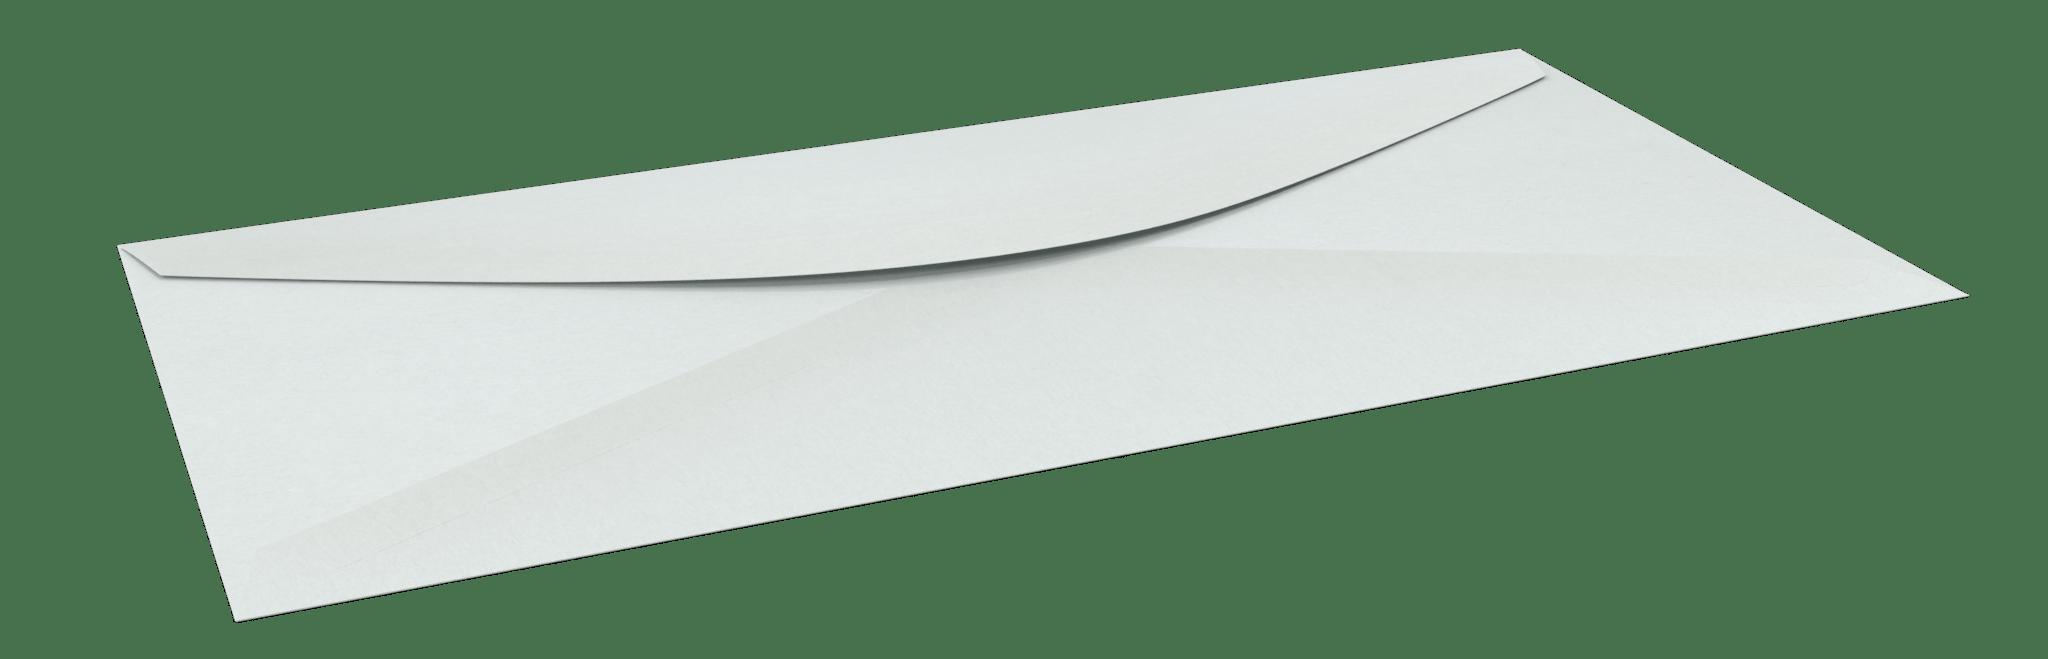 9 Envelope Template Download Adobe Indesign And Pdf Setup